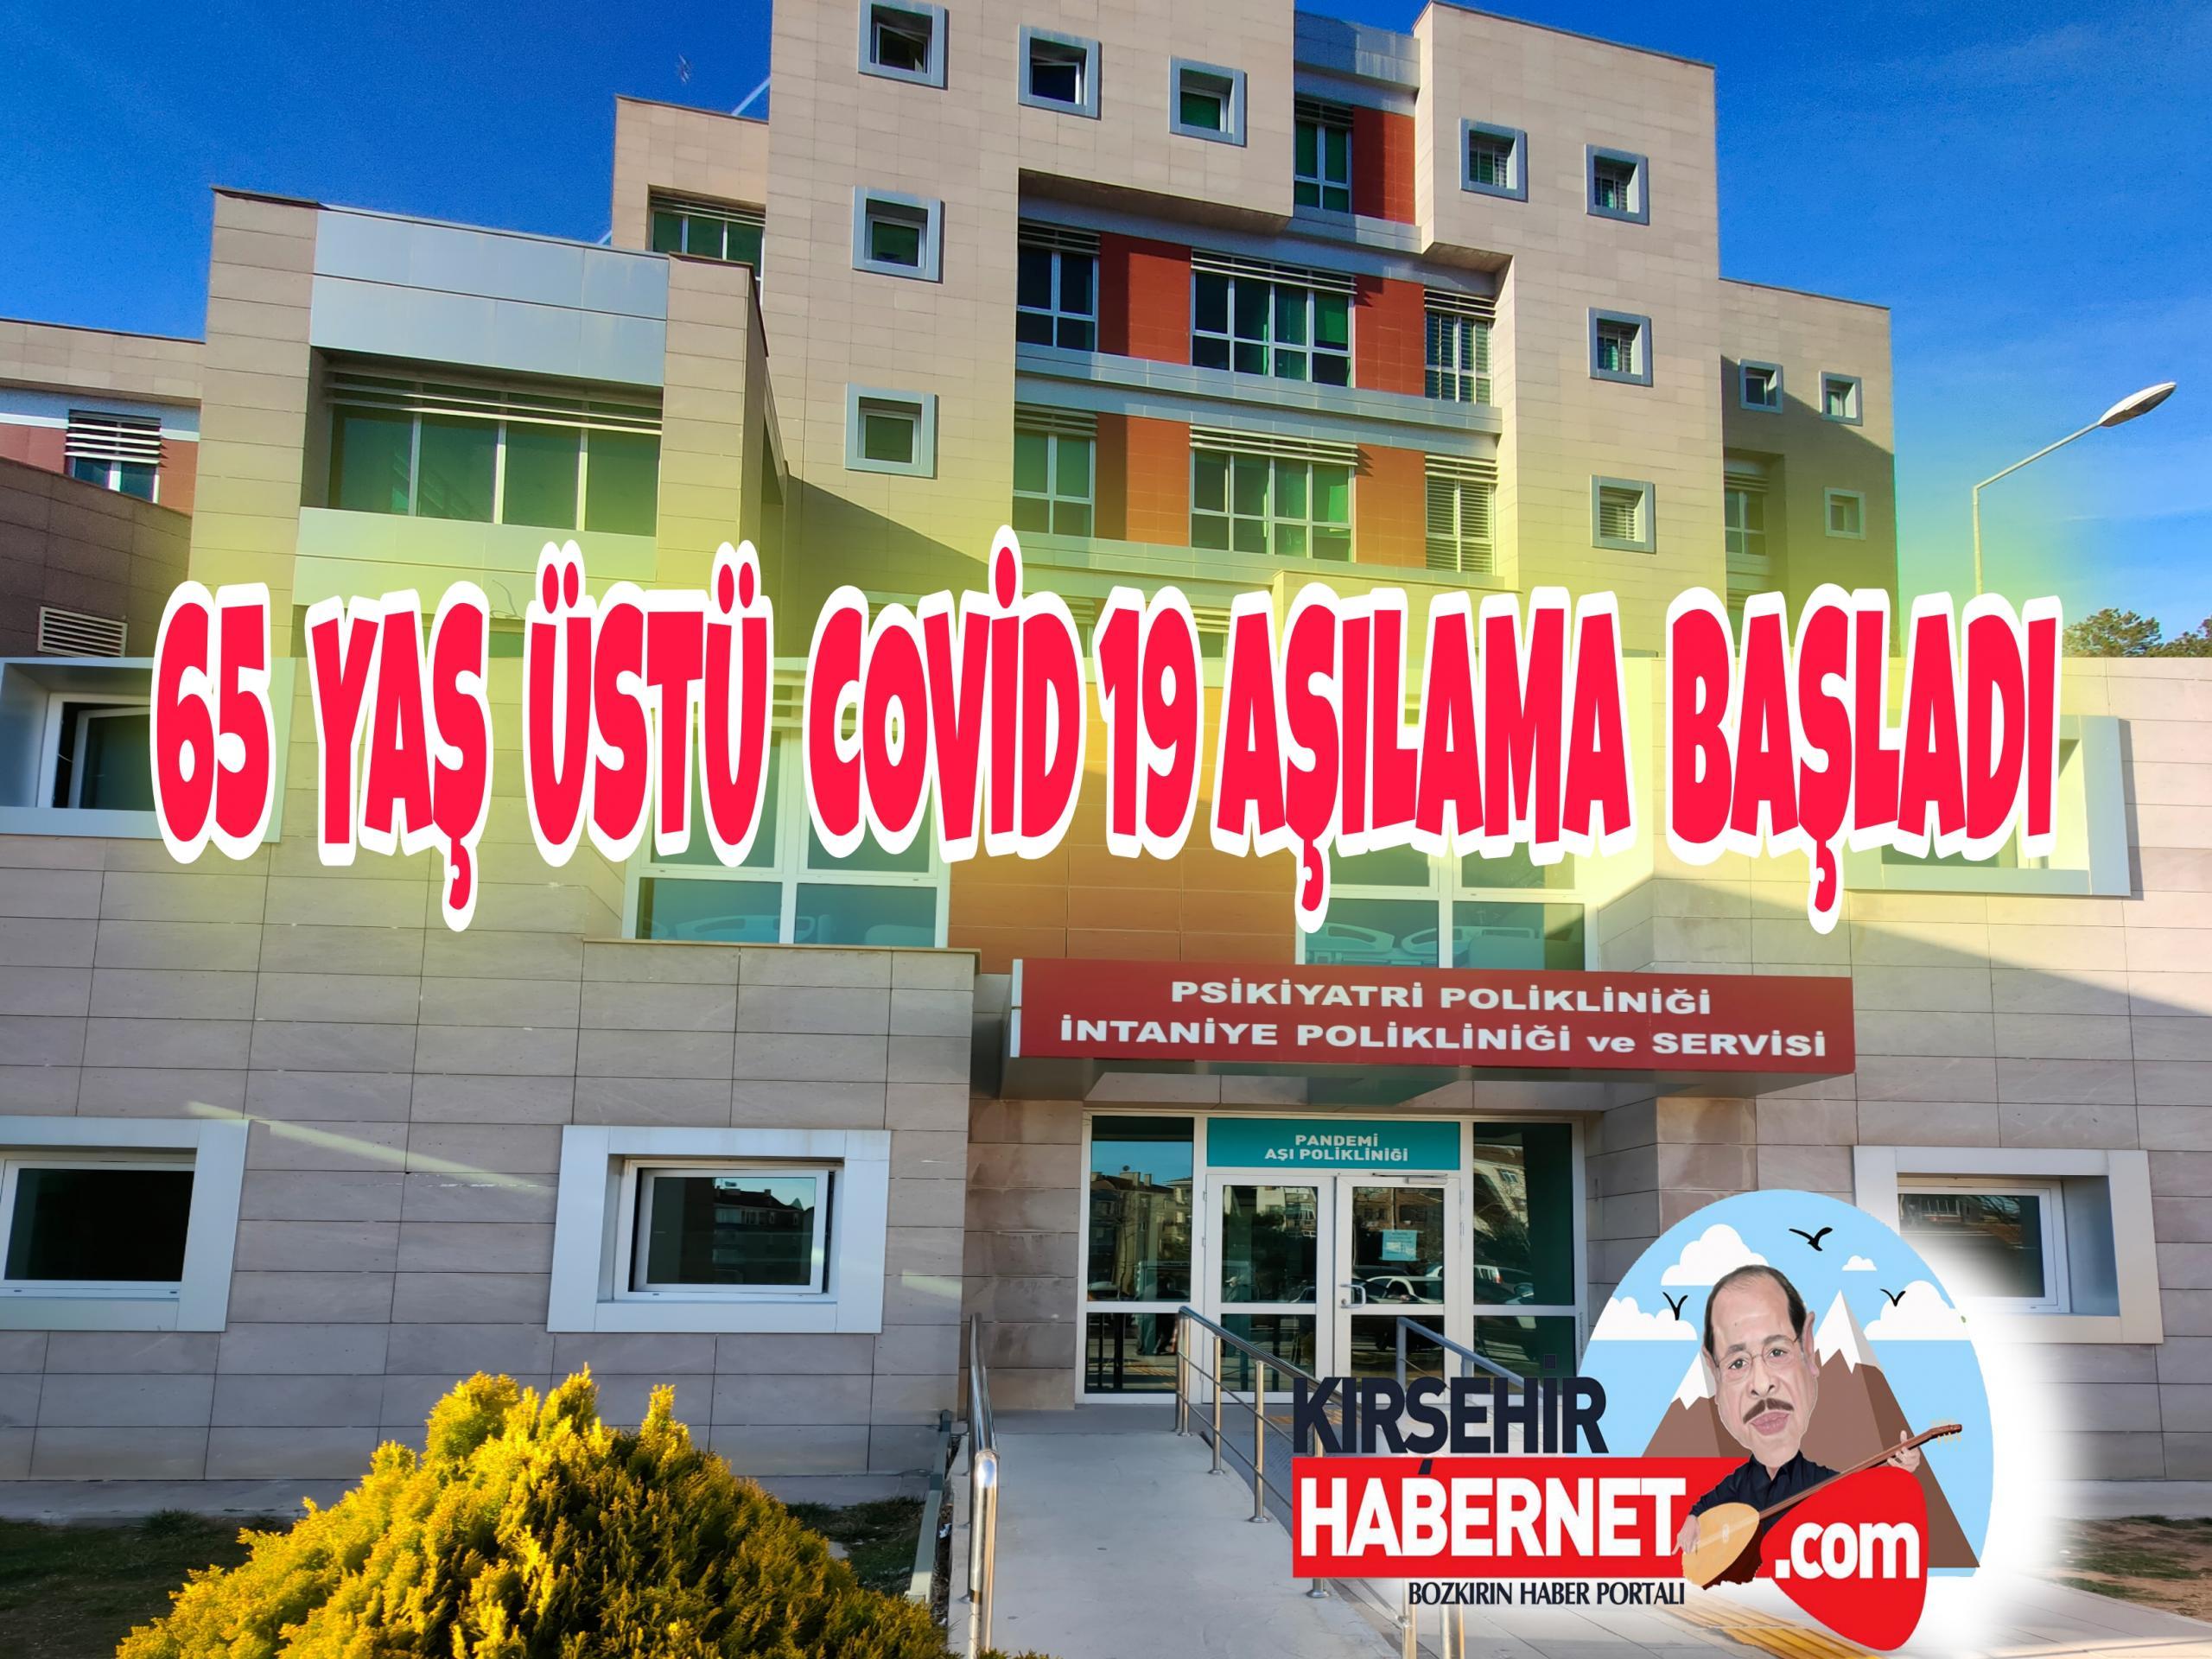 KIRŞEHİR' DE COVİD 19 AŞILAMA BAŞLADI !!